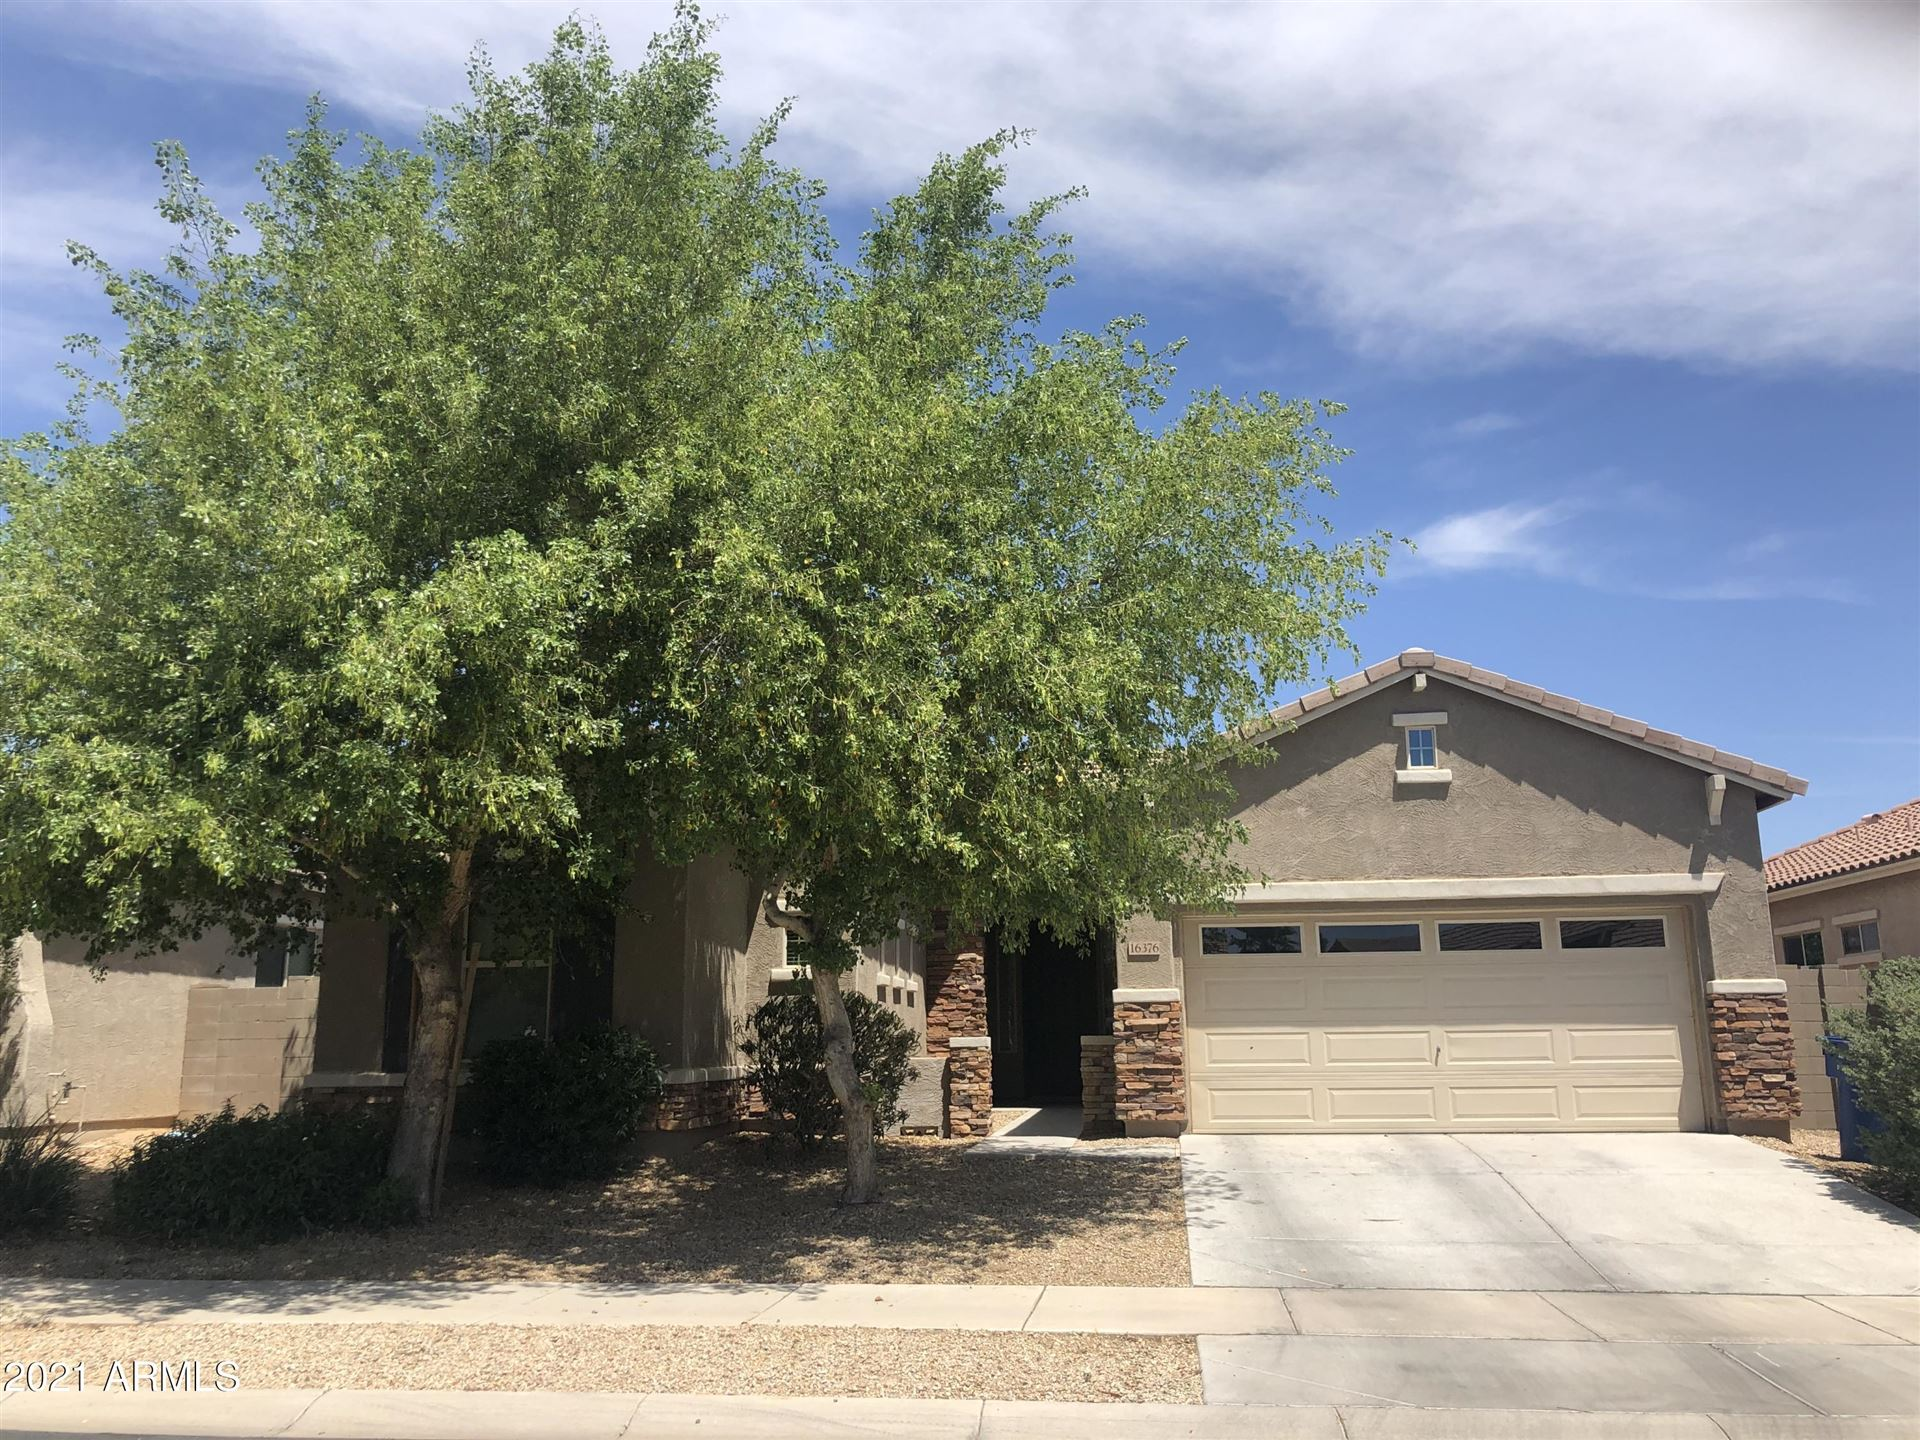 16376 W CORTEZ Street, Surprise, AZ 85388 - MLS#: 6235495